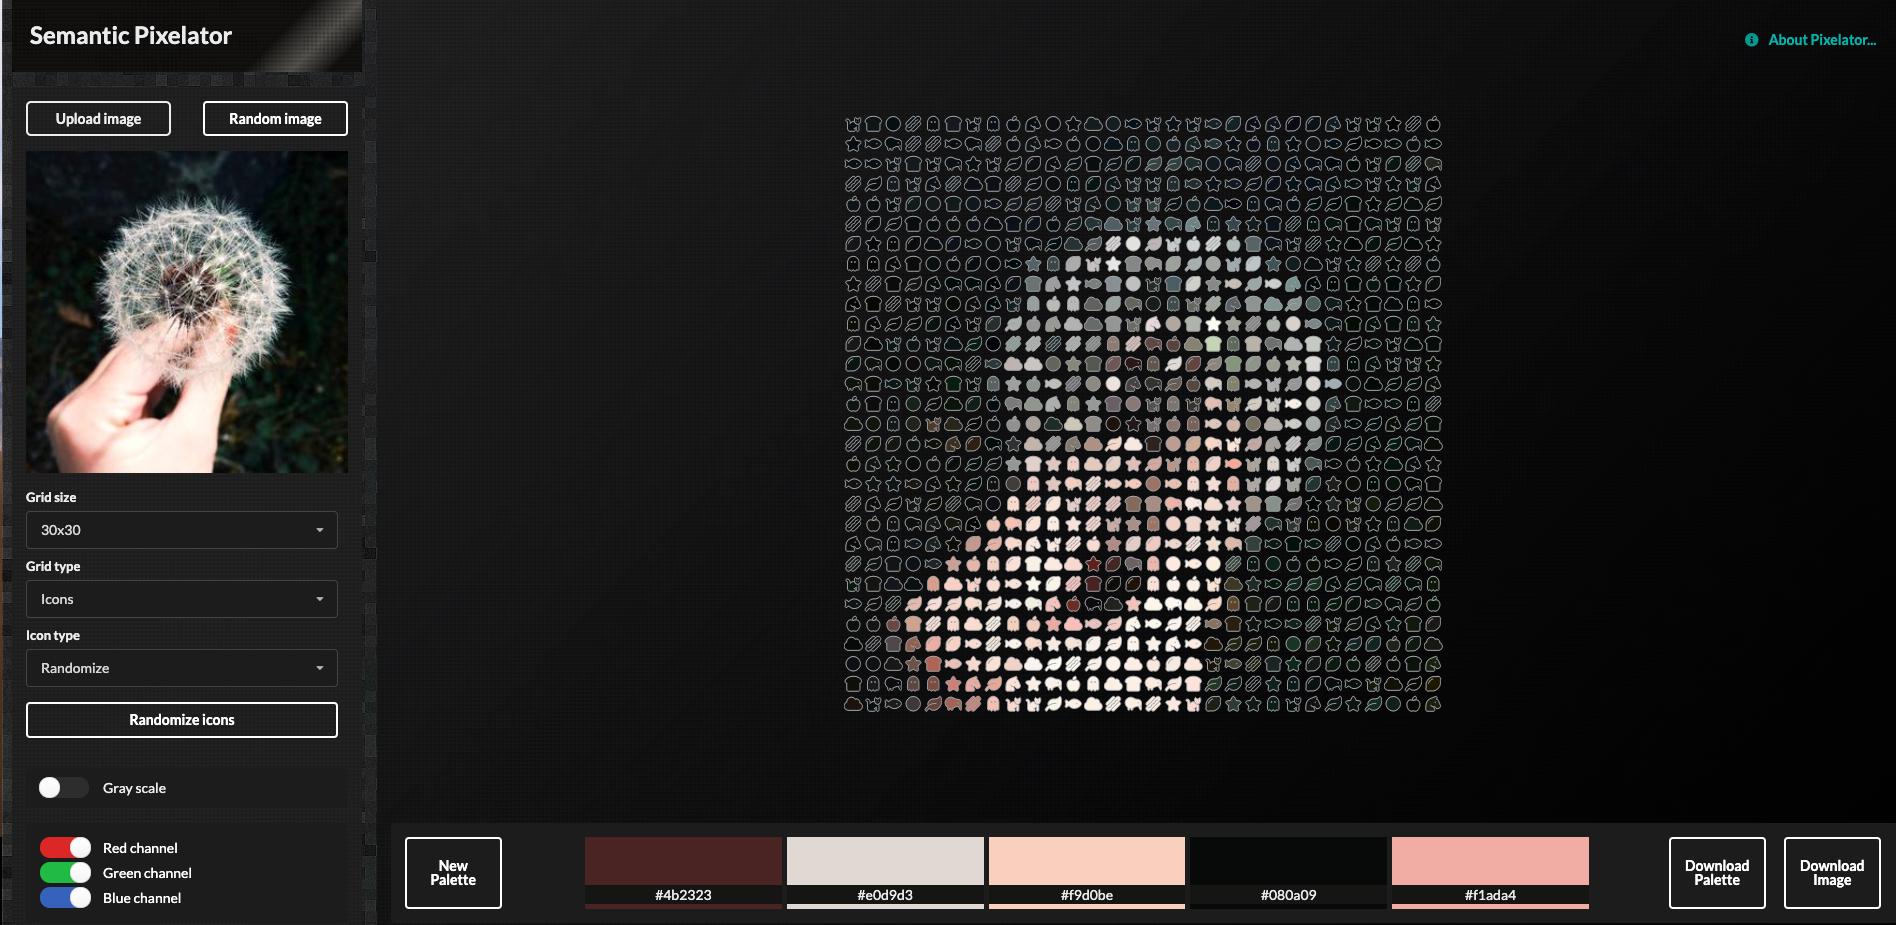 Screenshot from Semantic Pixelator app